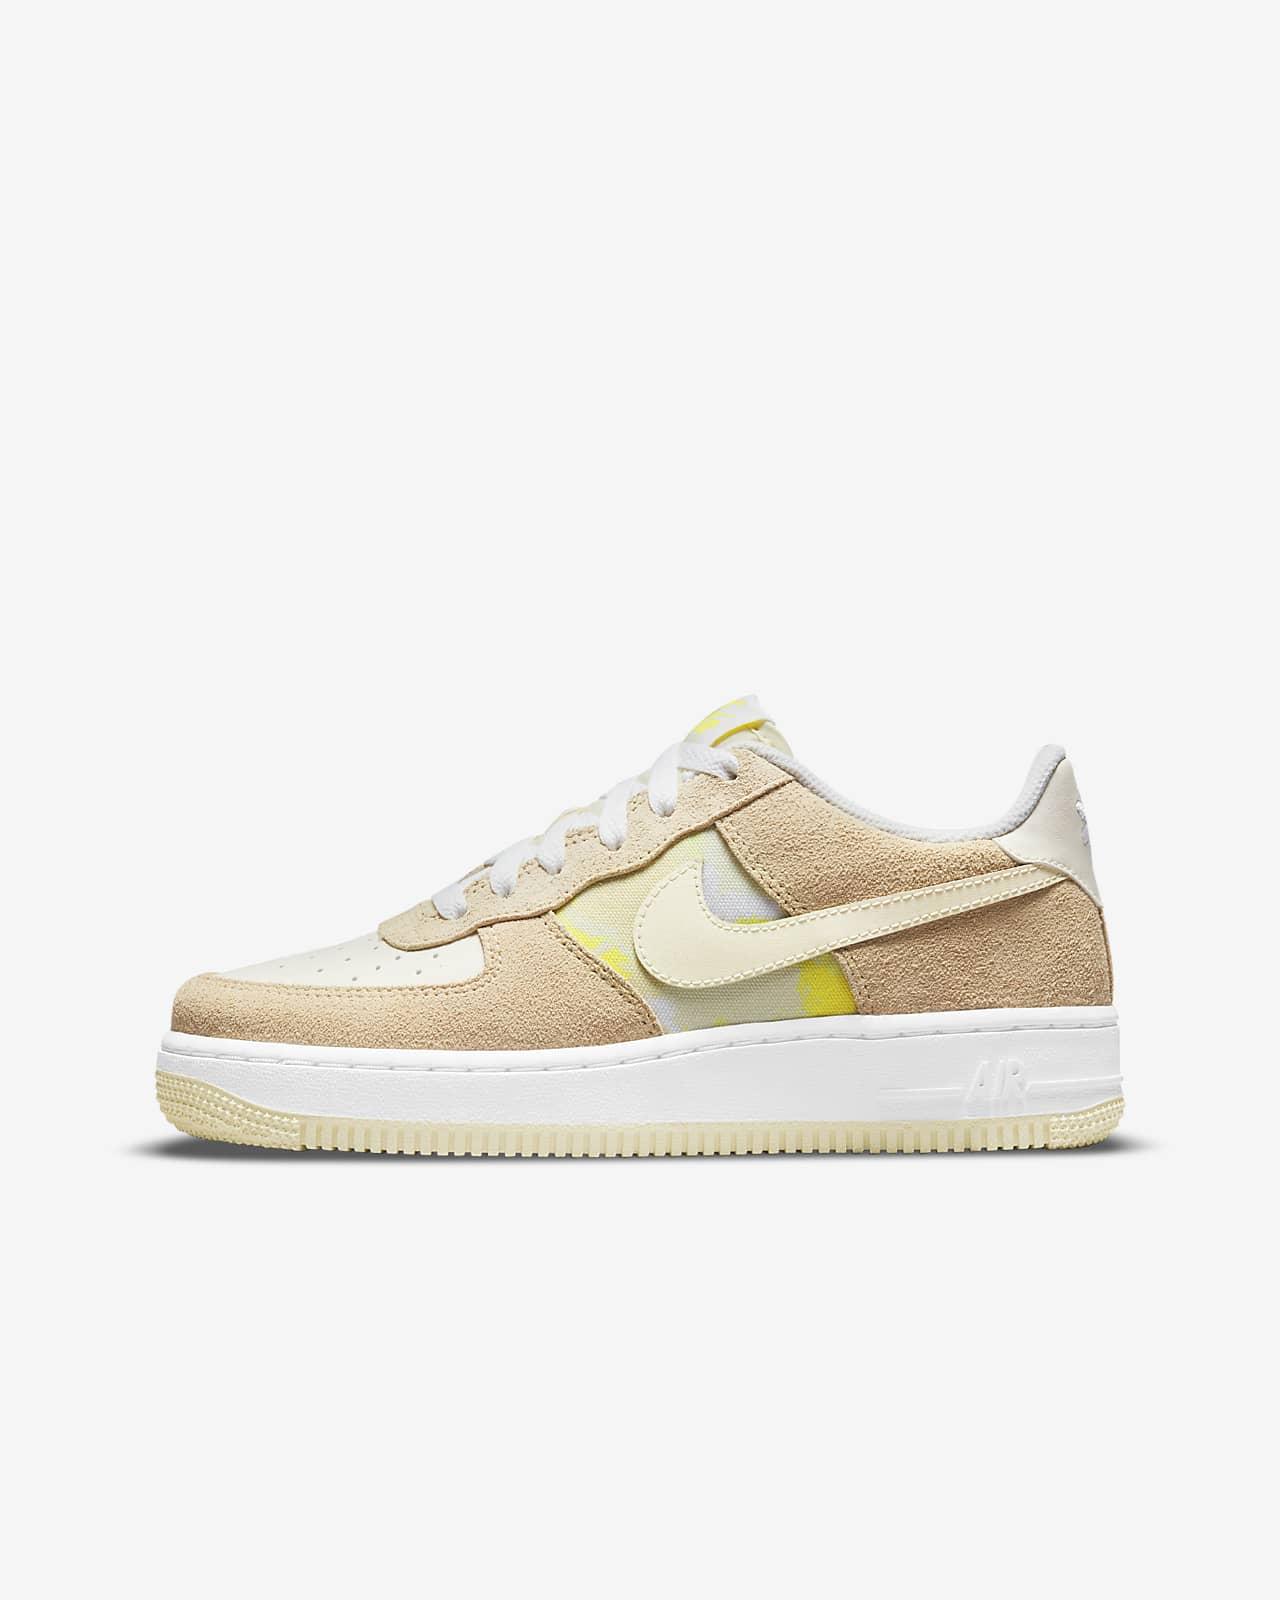 Nike Air Force 1 Low Older Kids' Shoe